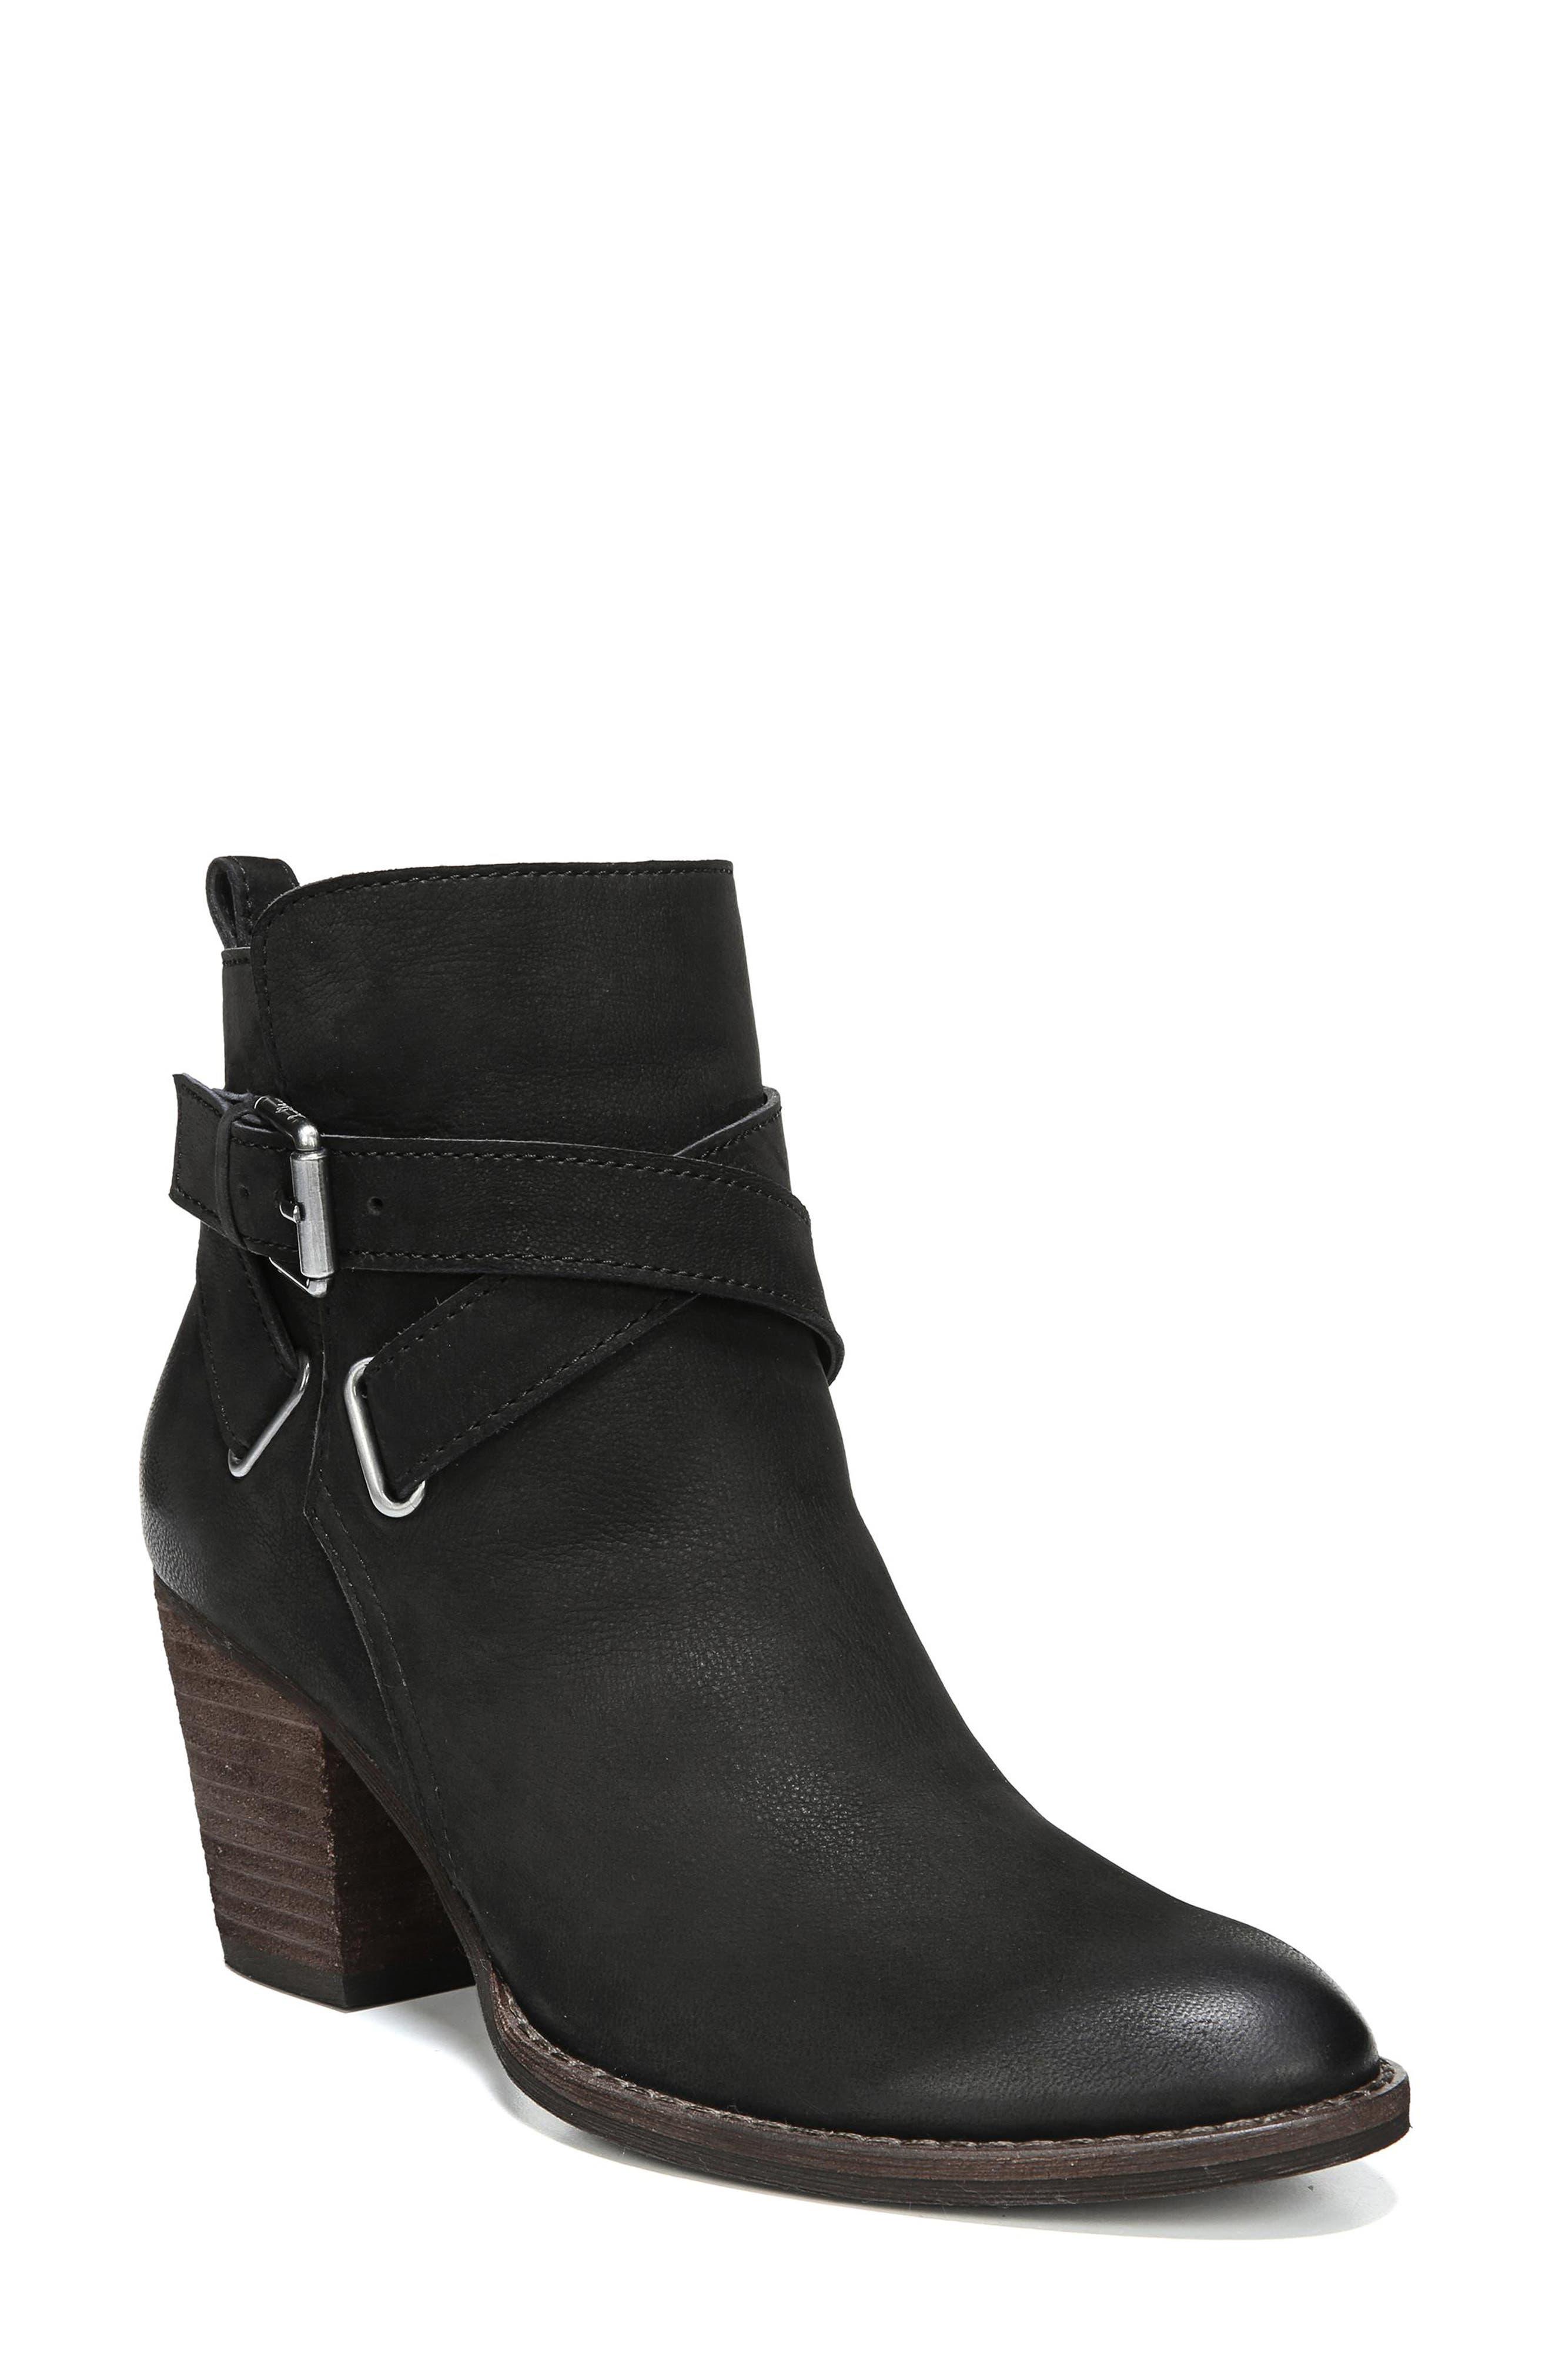 SAM EDELMAN Women'S Morris Almond Toe Leather Mid-Heel Booties in Black Leather